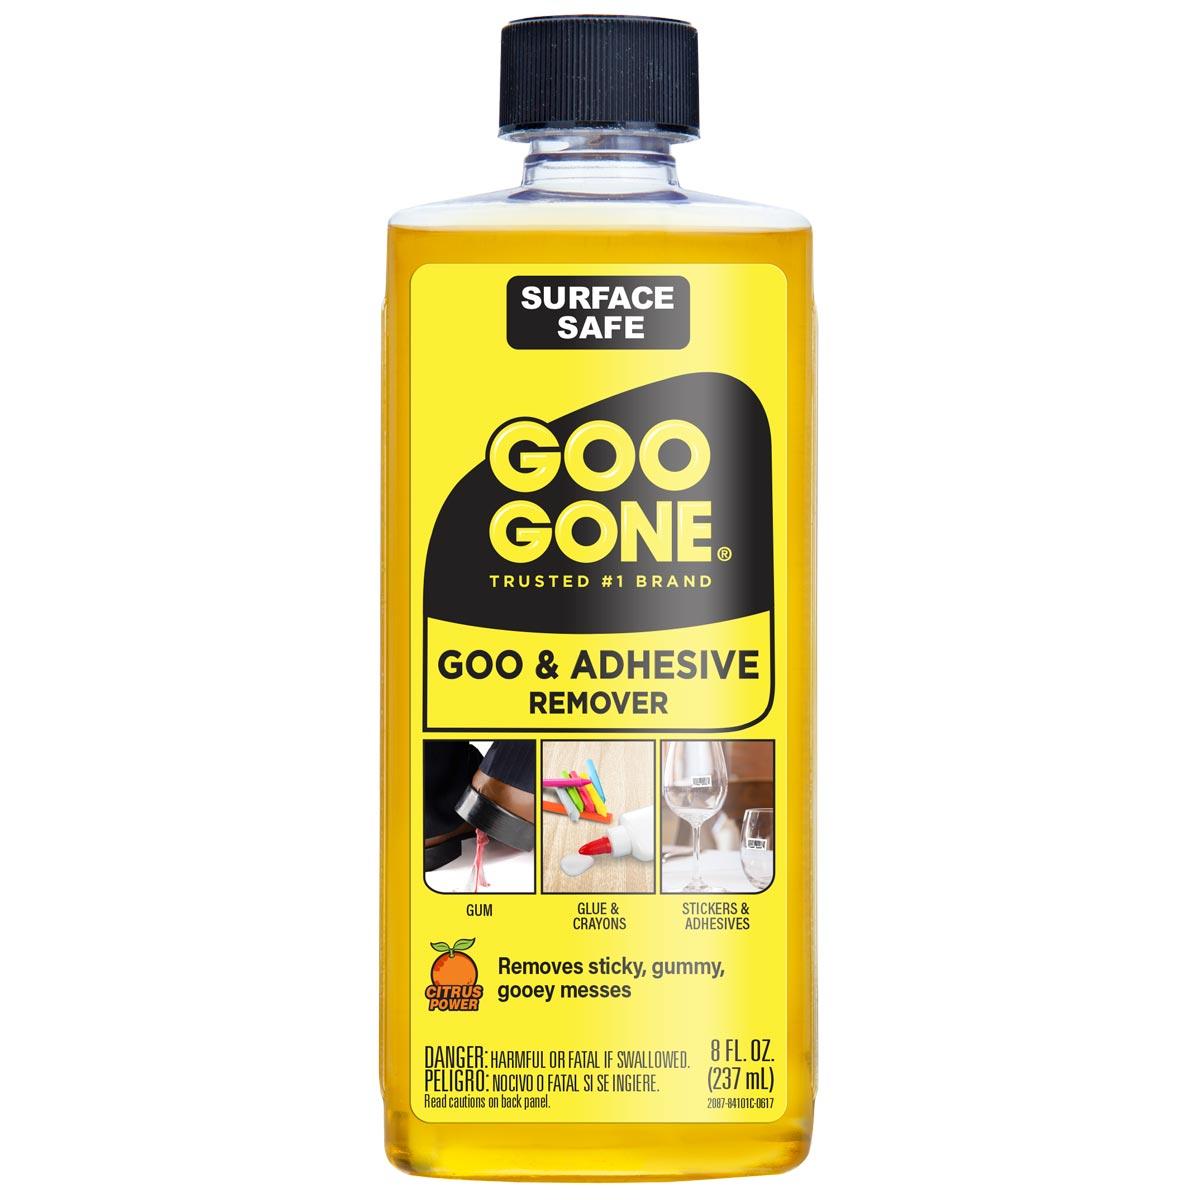 https://googone.com/media/catalog/product/g/o/goo-gone-original-8oz_front.jpg